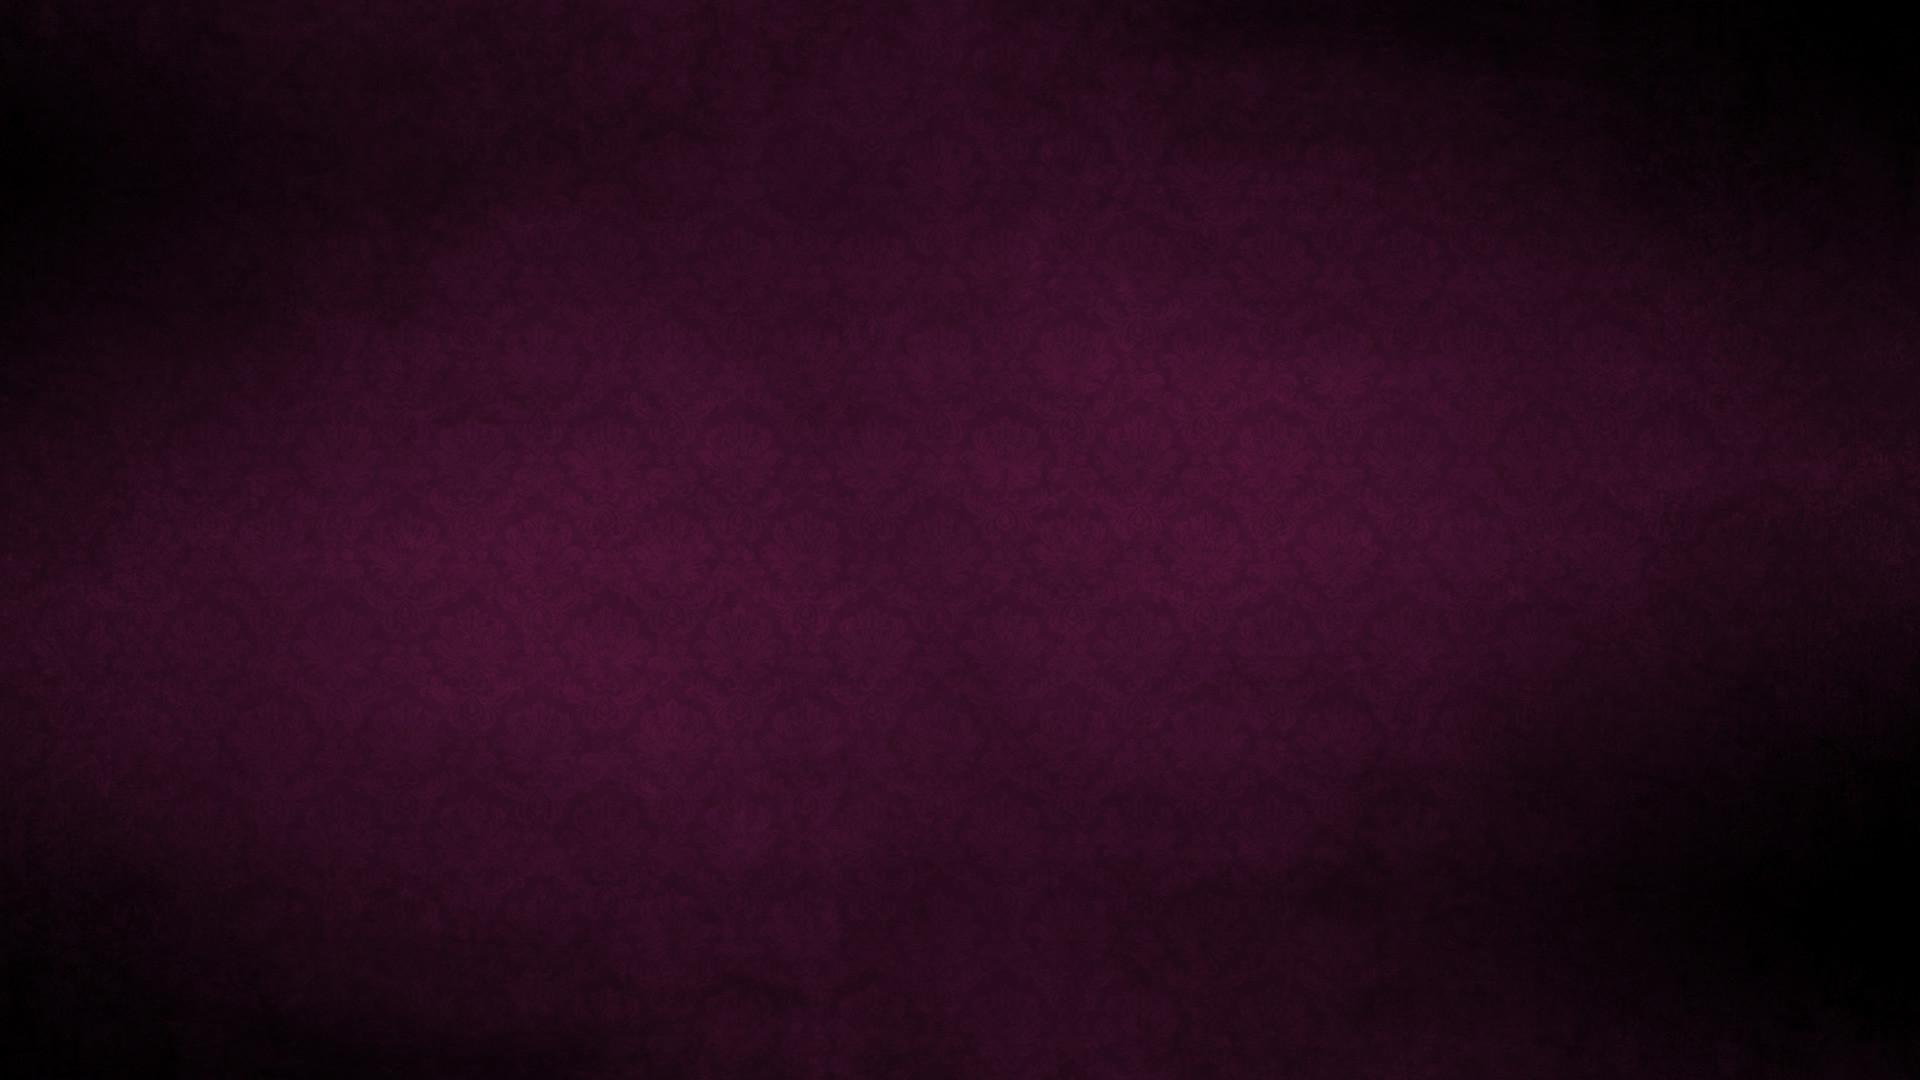 Plain Victorian Wallpaper Plain, Victorian, Gothic, Violet .